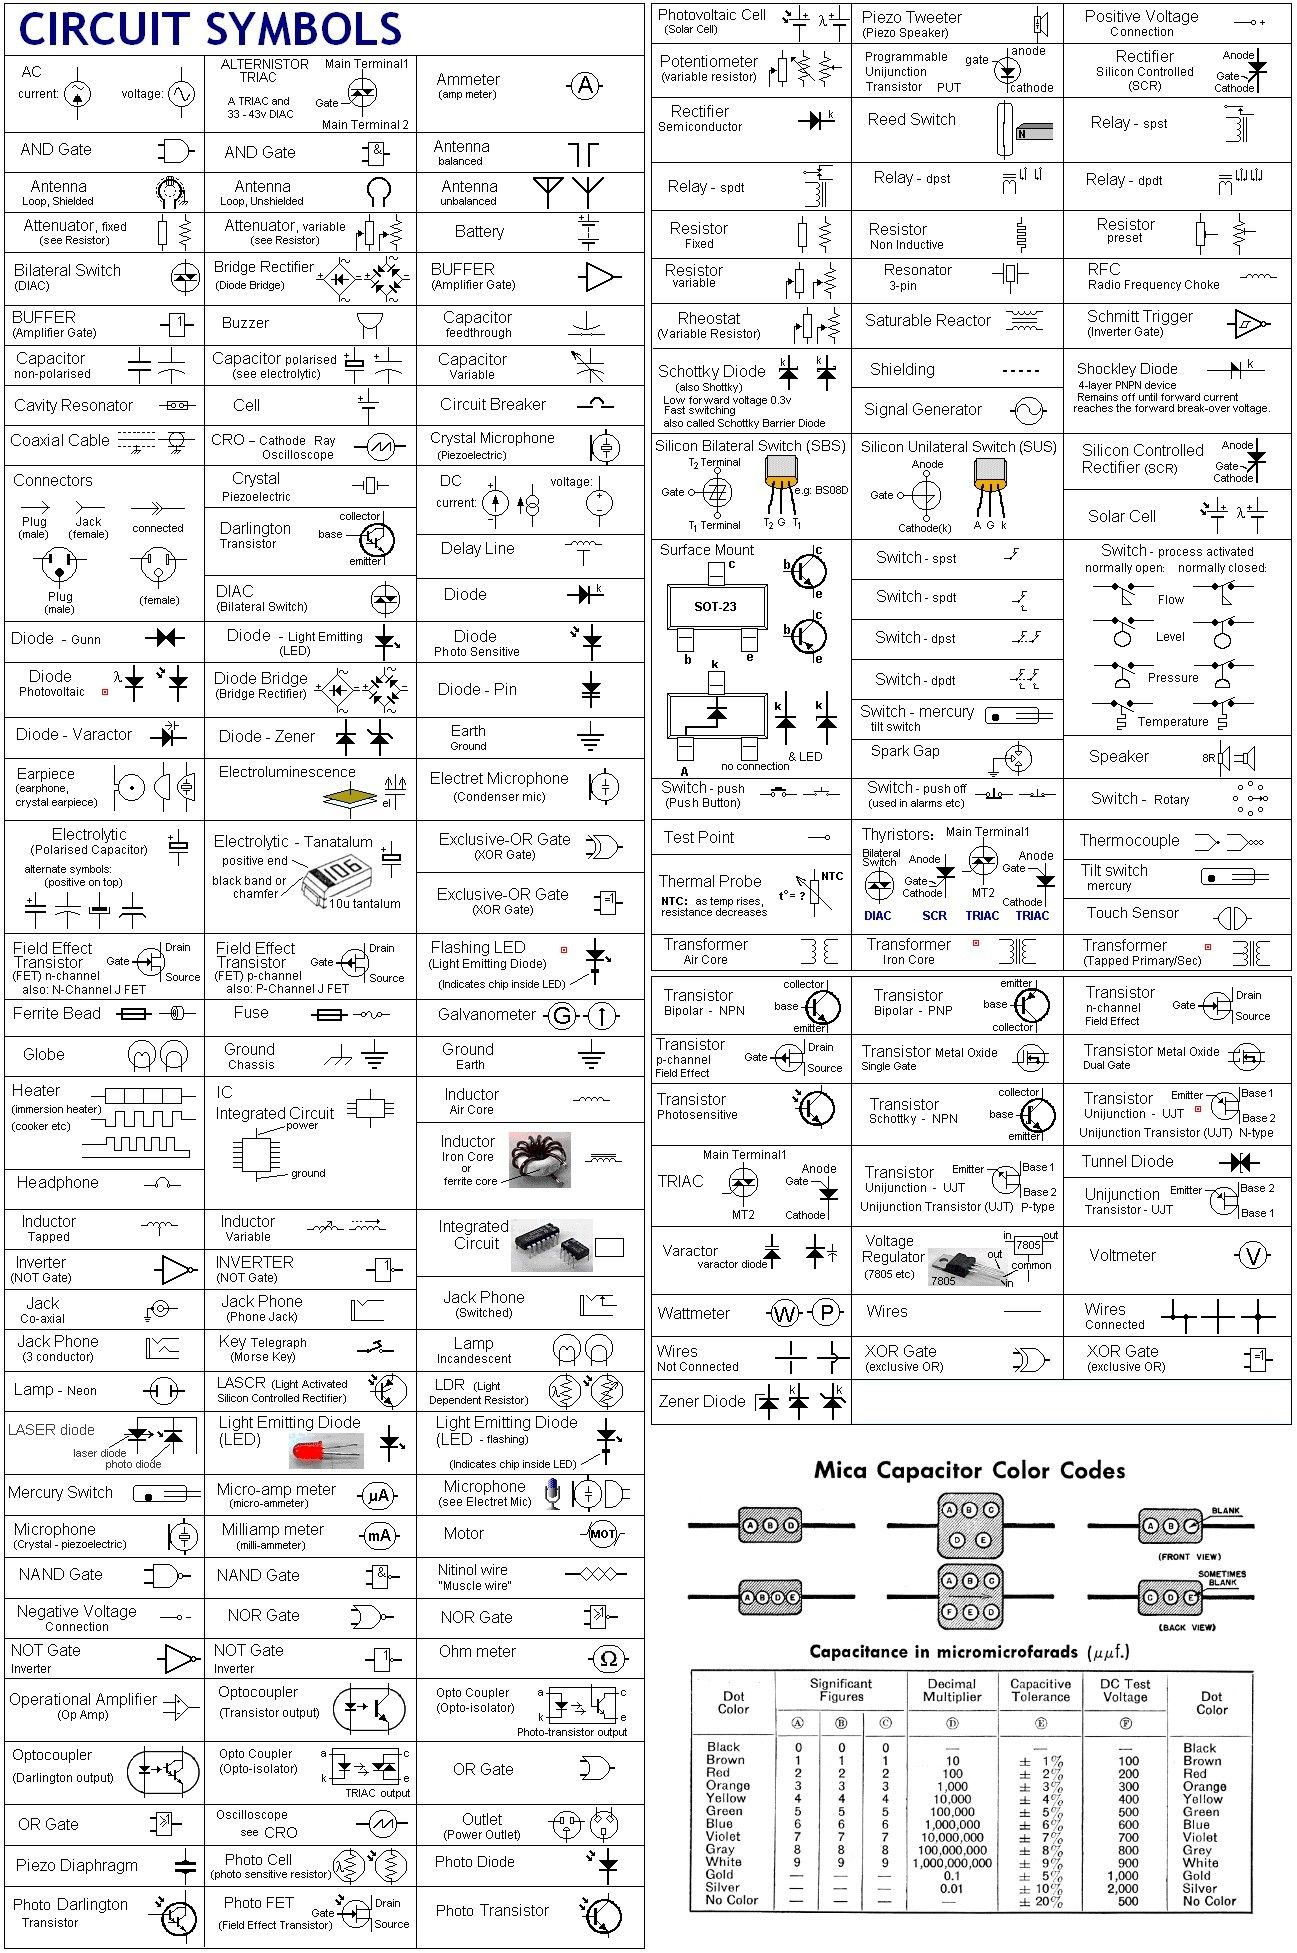 u300cwiring diagram sample u300d u304a u3057 u3083 u308c u307e u3068 u3081 u306e u4eba u6c17 u30a2 u30a4 u30c7 u30a2 uff5cpinterest  uff5cjohn houston u30102019 u3011